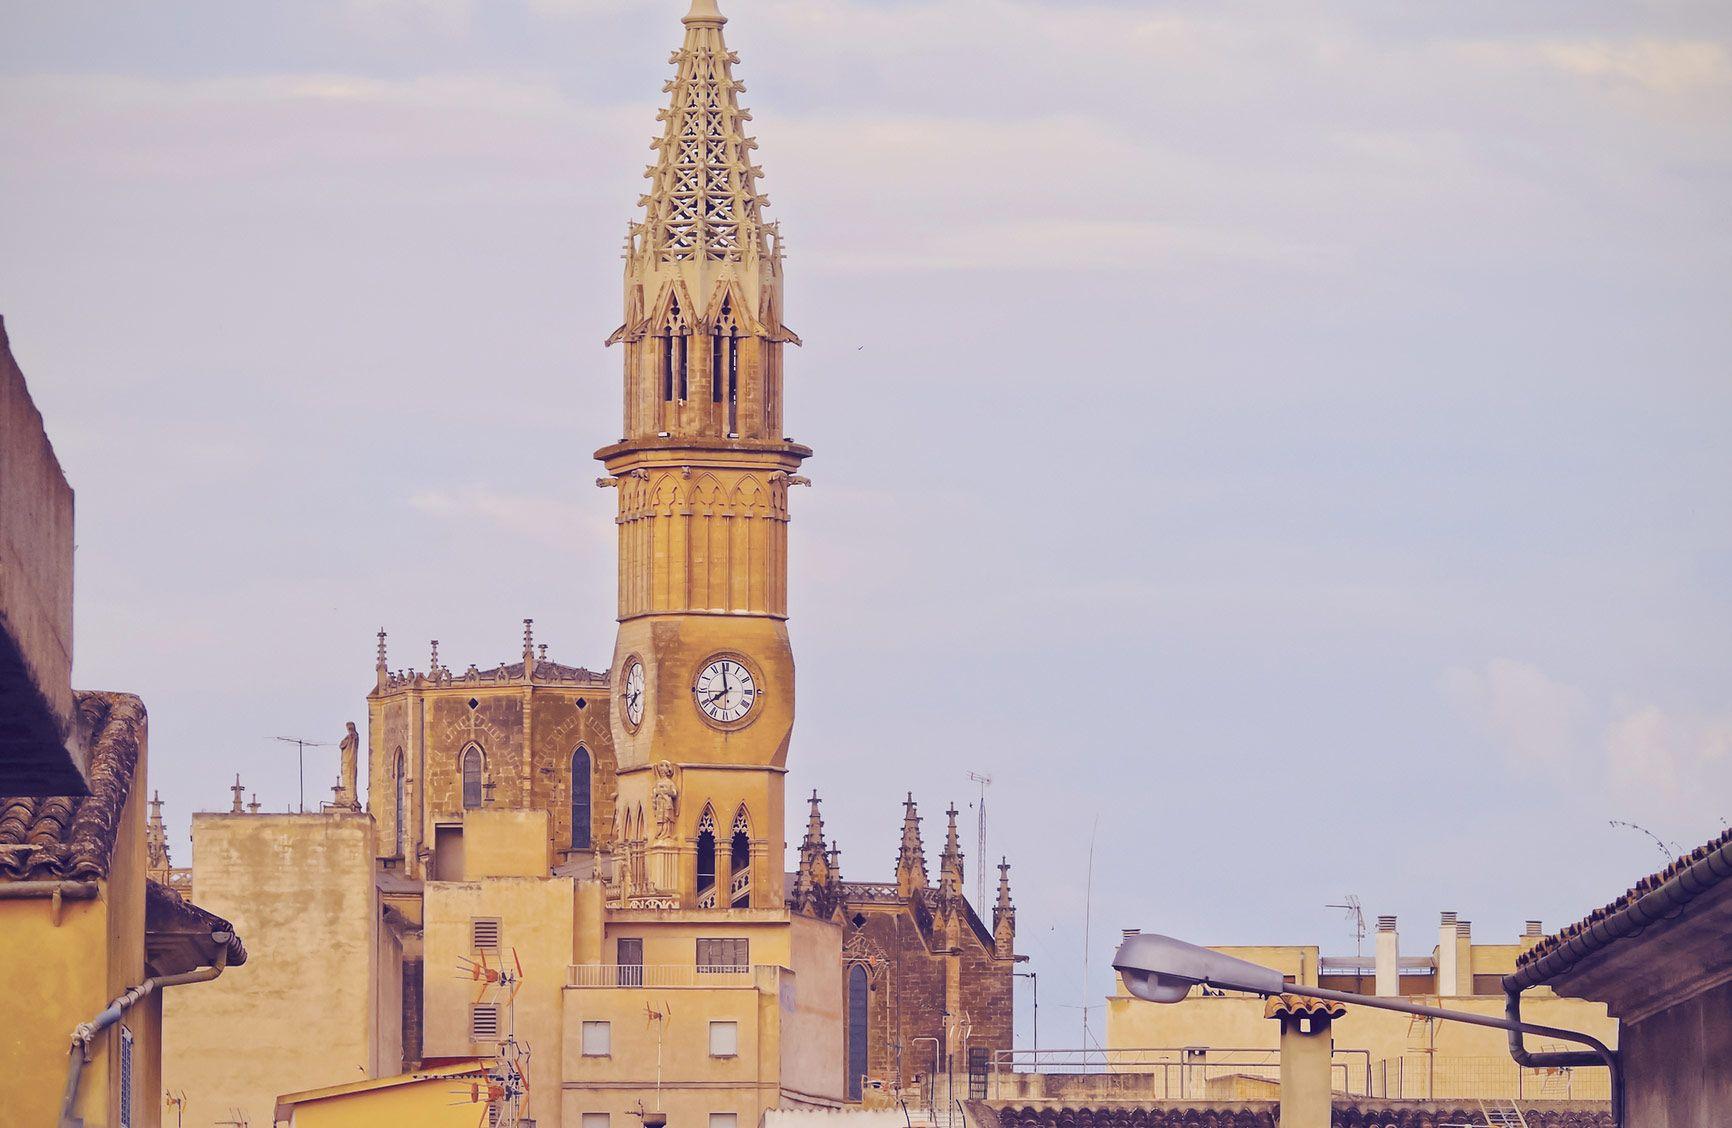 Manacor Qu ver en Manacor  Gua de Mallorca  Tripkay